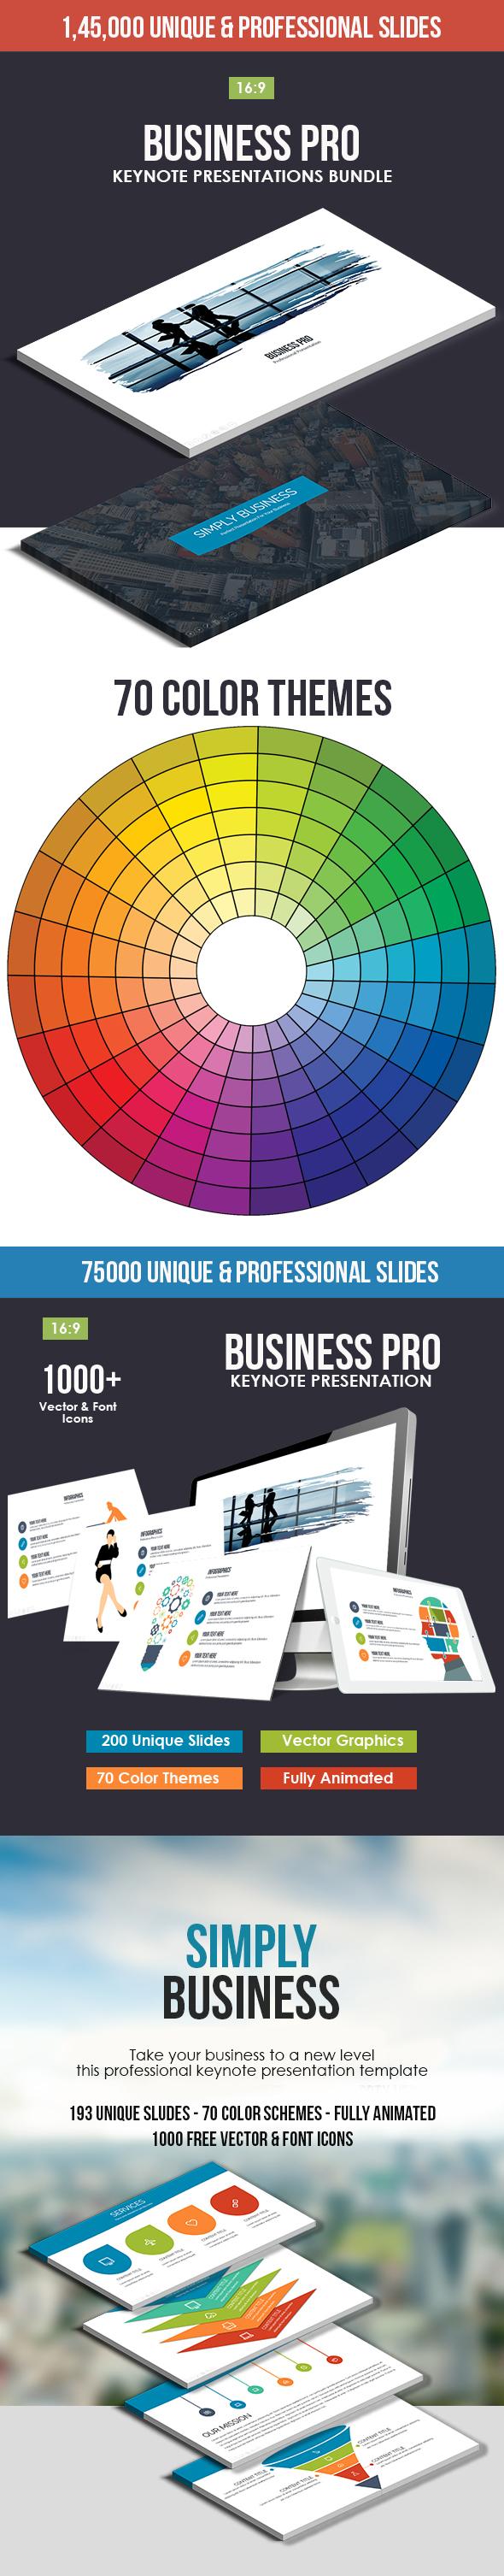 Business Pro 2017 Keynote Presentations Bundle - Business Keynote Templates